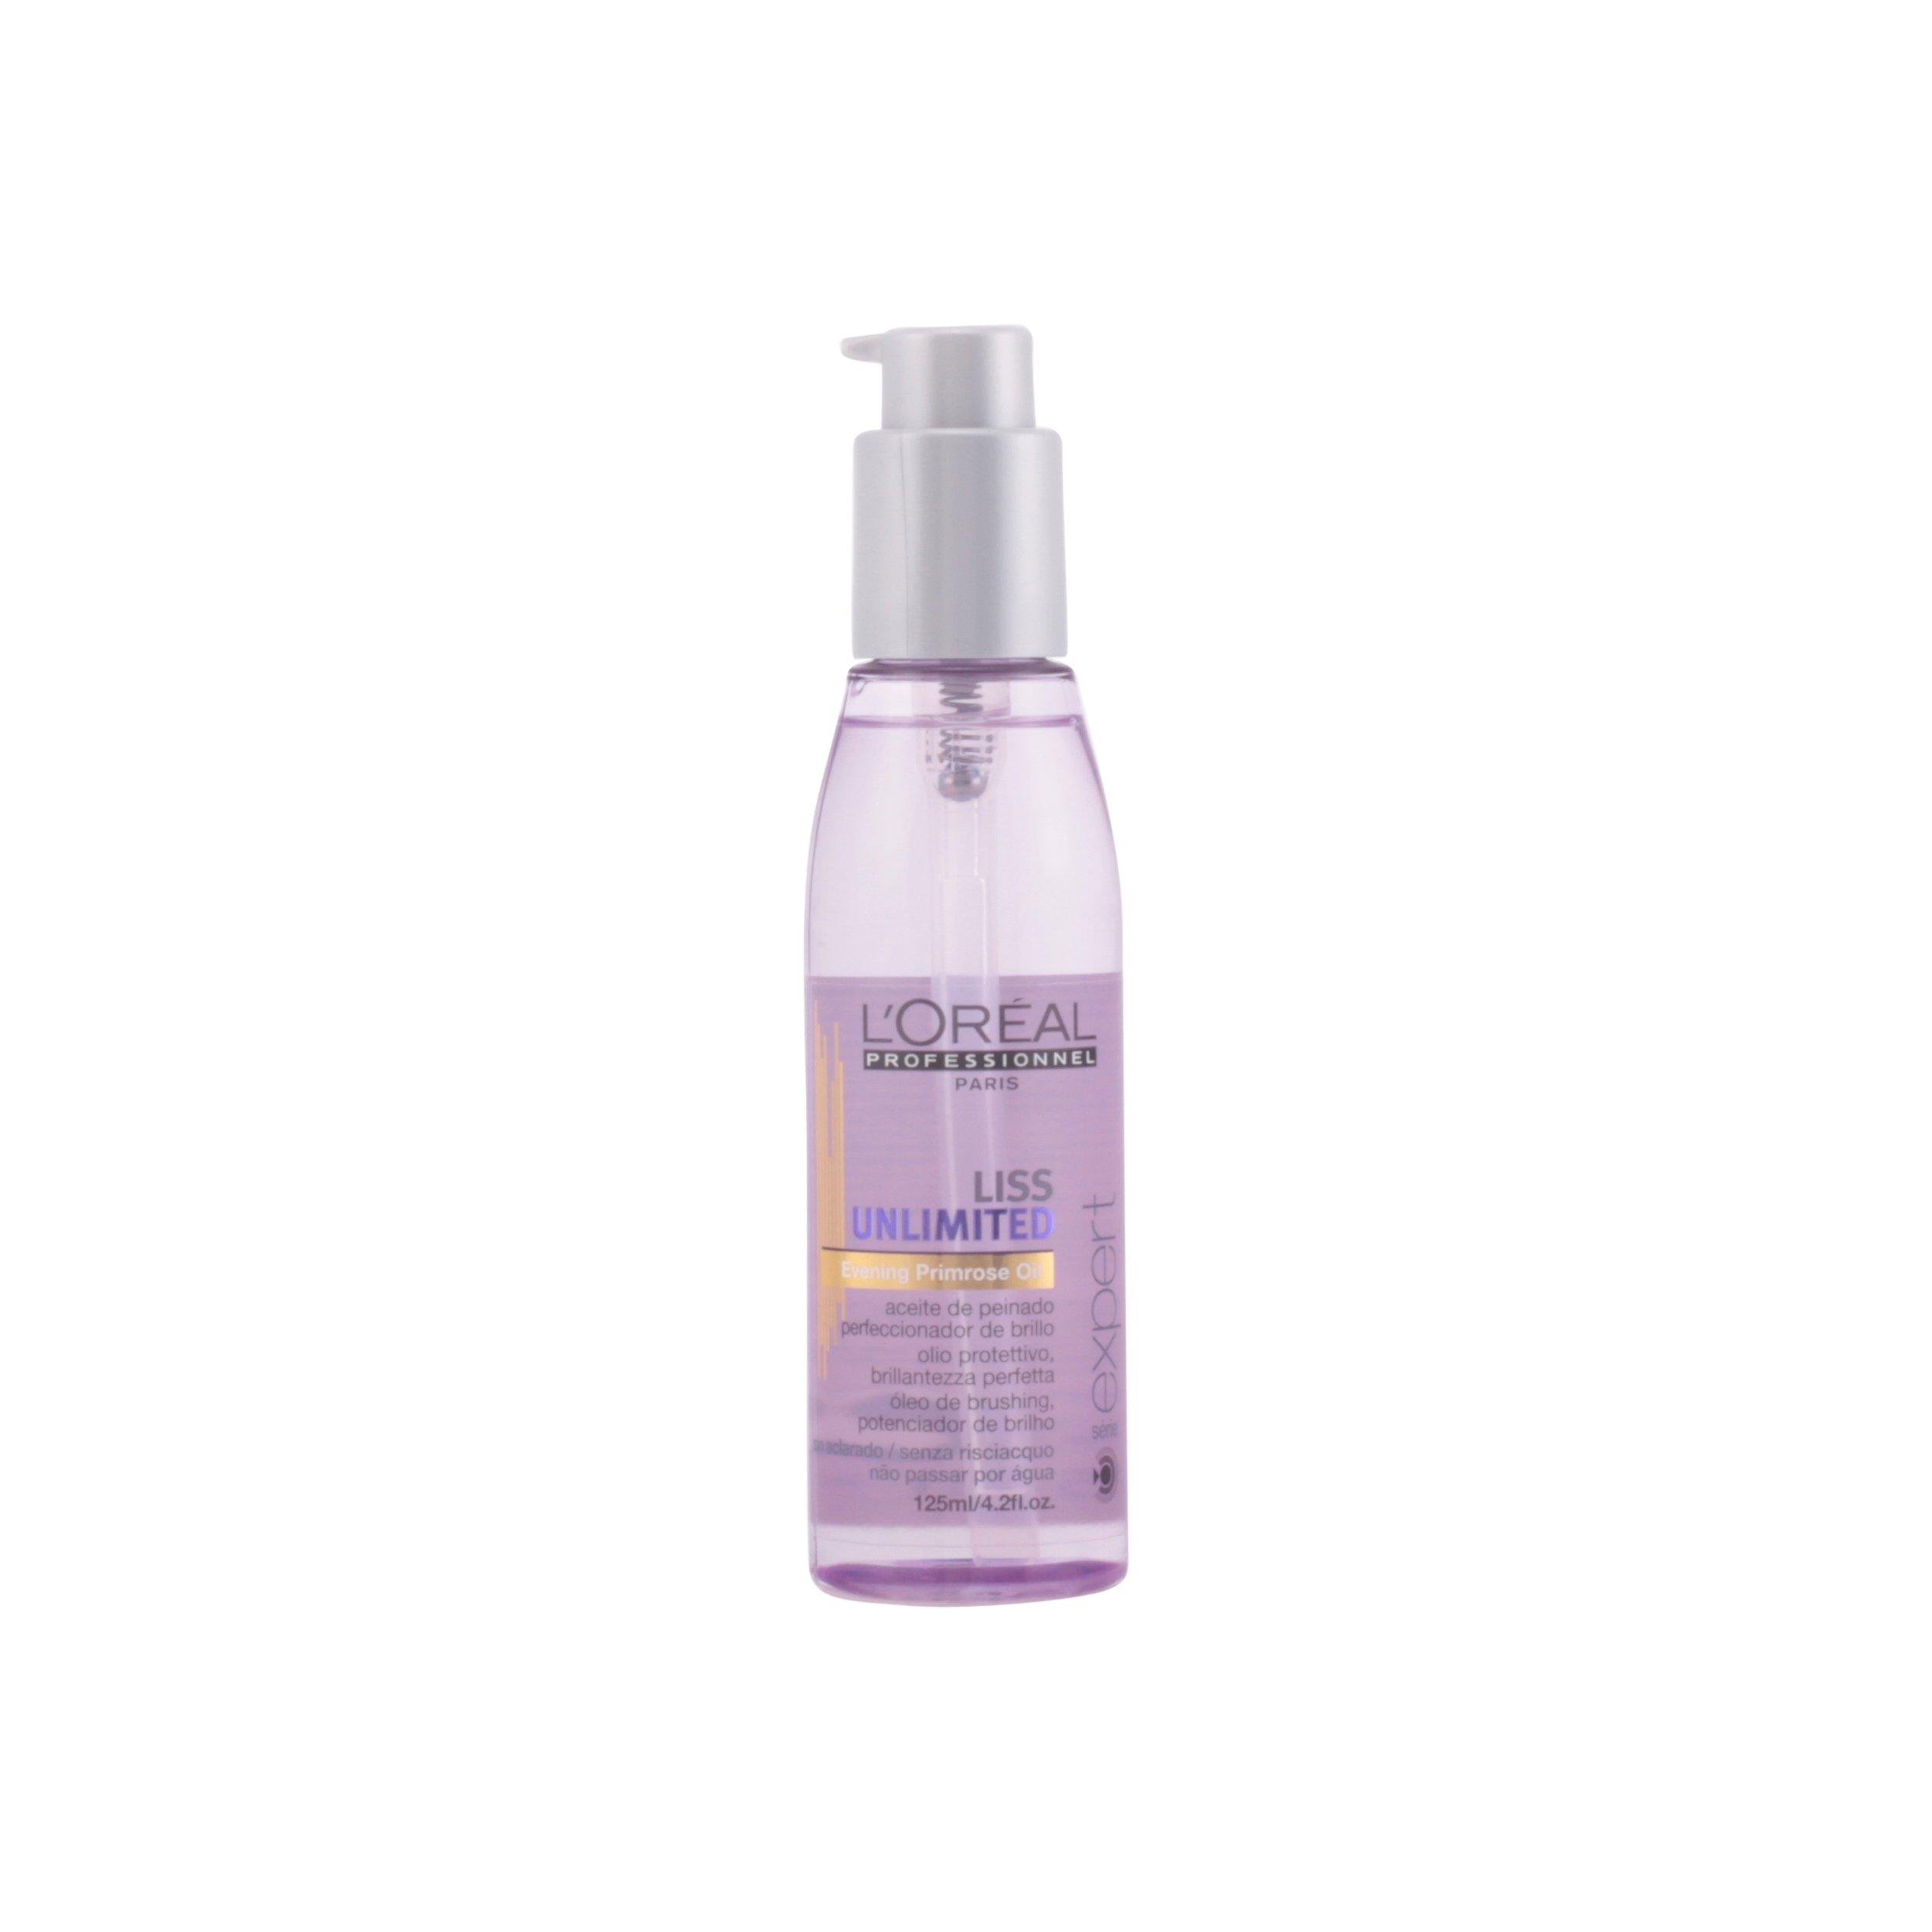 f6ca9b0ca Amazon.com: L'Oreal Liss Unlimited Evening Primrose Oil, 4.2 Ounce: Beauty